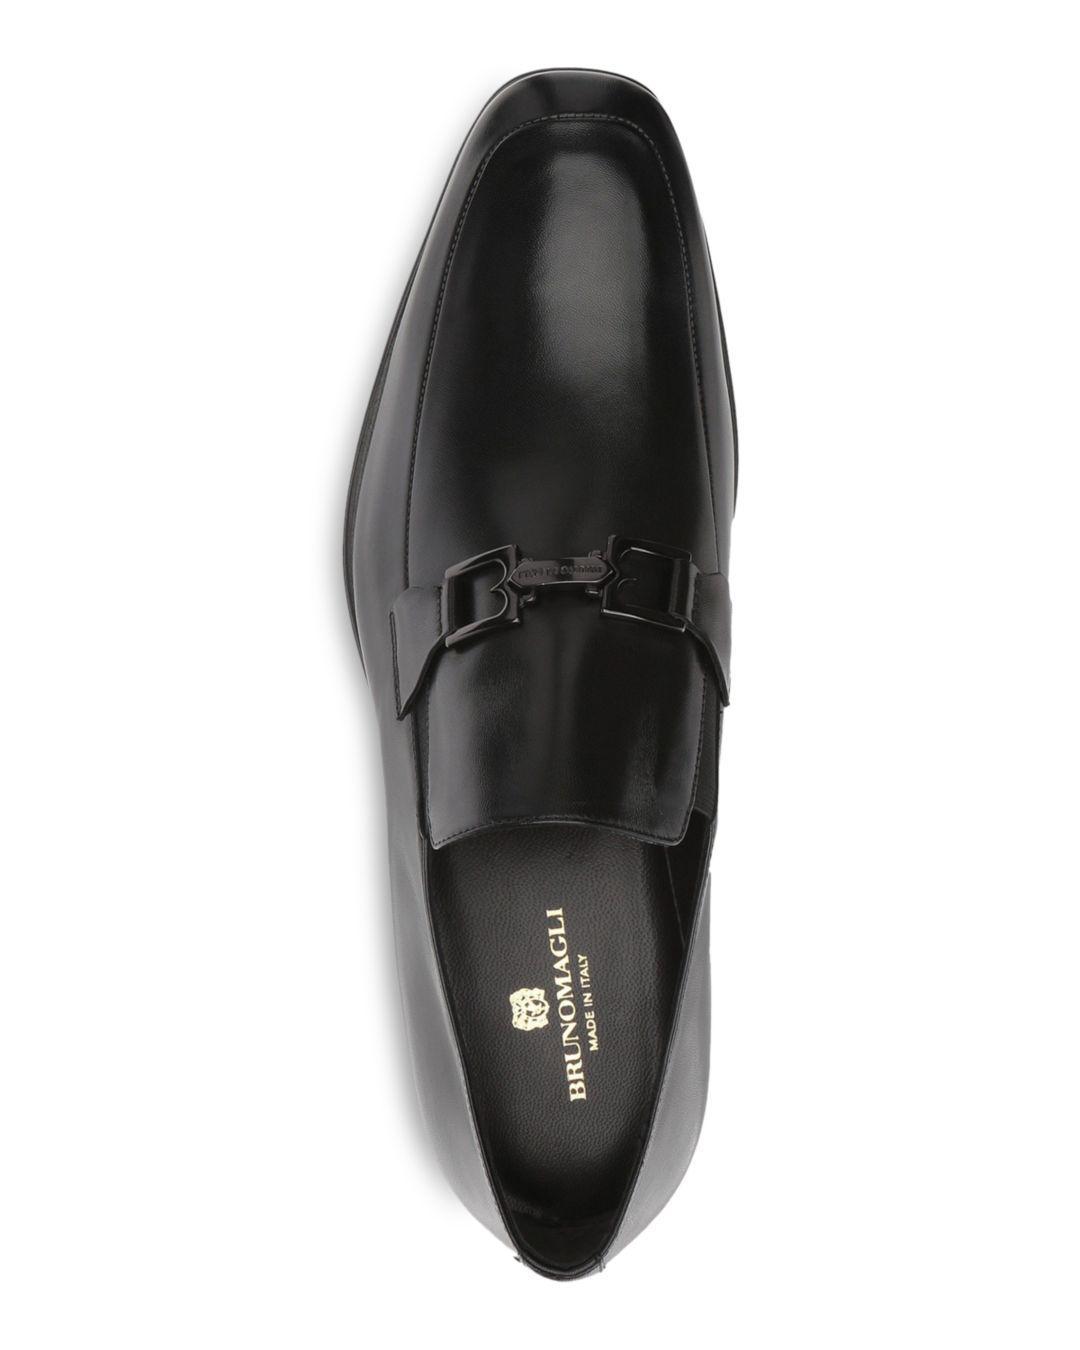 248b8c30a3c Lyst - Bruno Magli Men s Roberto Loafers in Black for Men